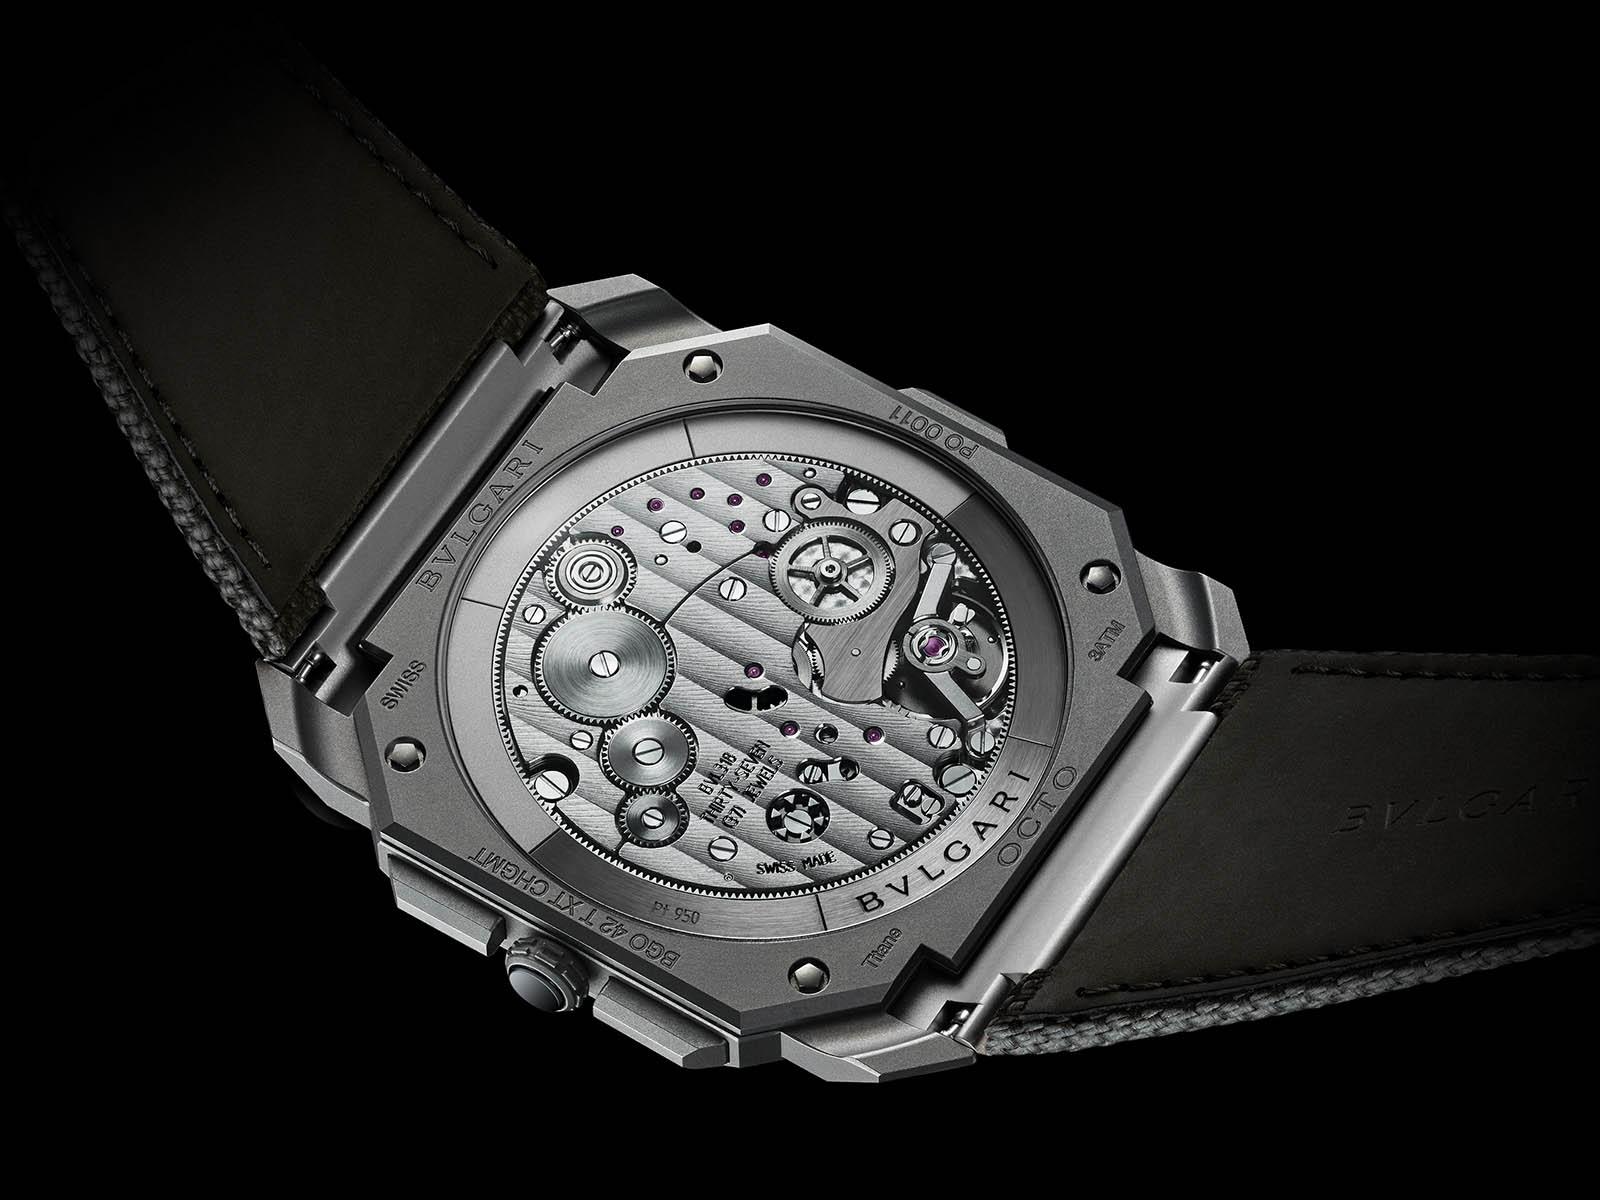 bulgari-octo-finissimo-chronograph-gmt-titanium-lvmh-2021-novelties-3.jpg